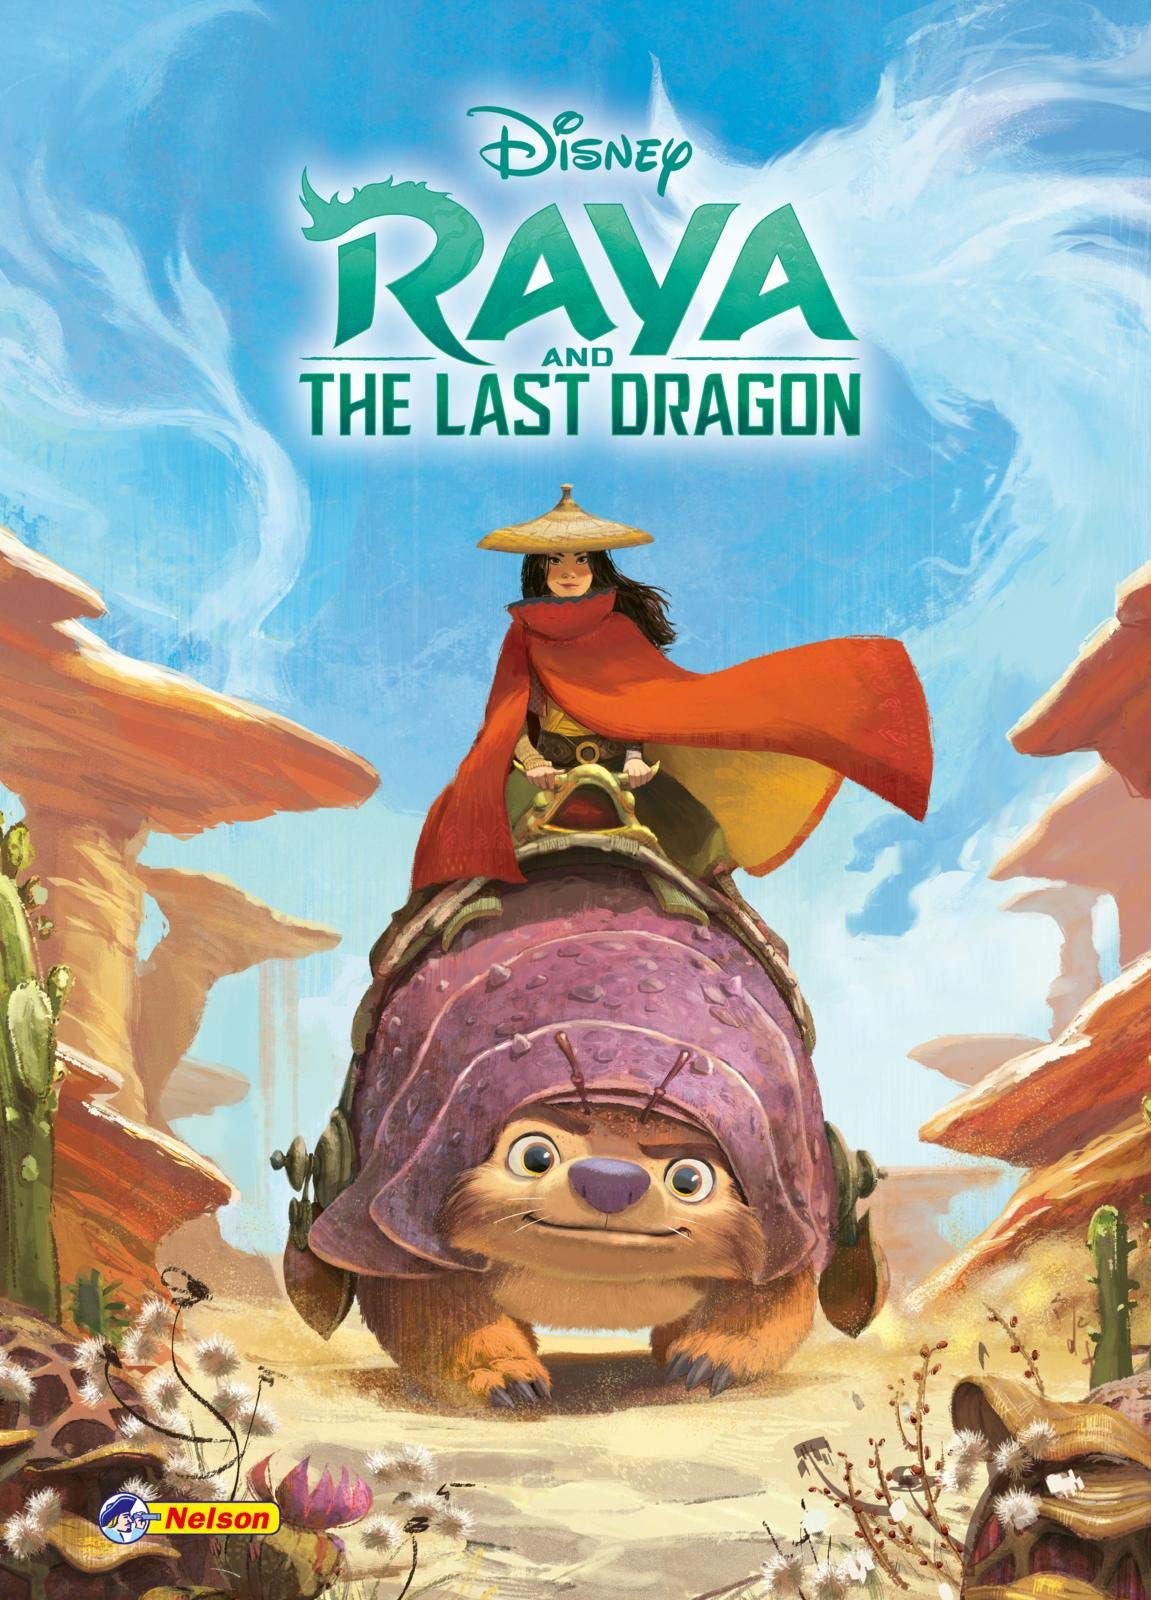 Raya et le Dernier Dragon [Walt Disney - 2021] - Page 5 Eh4DXYXXkAADxy6?format=jpg&name=large